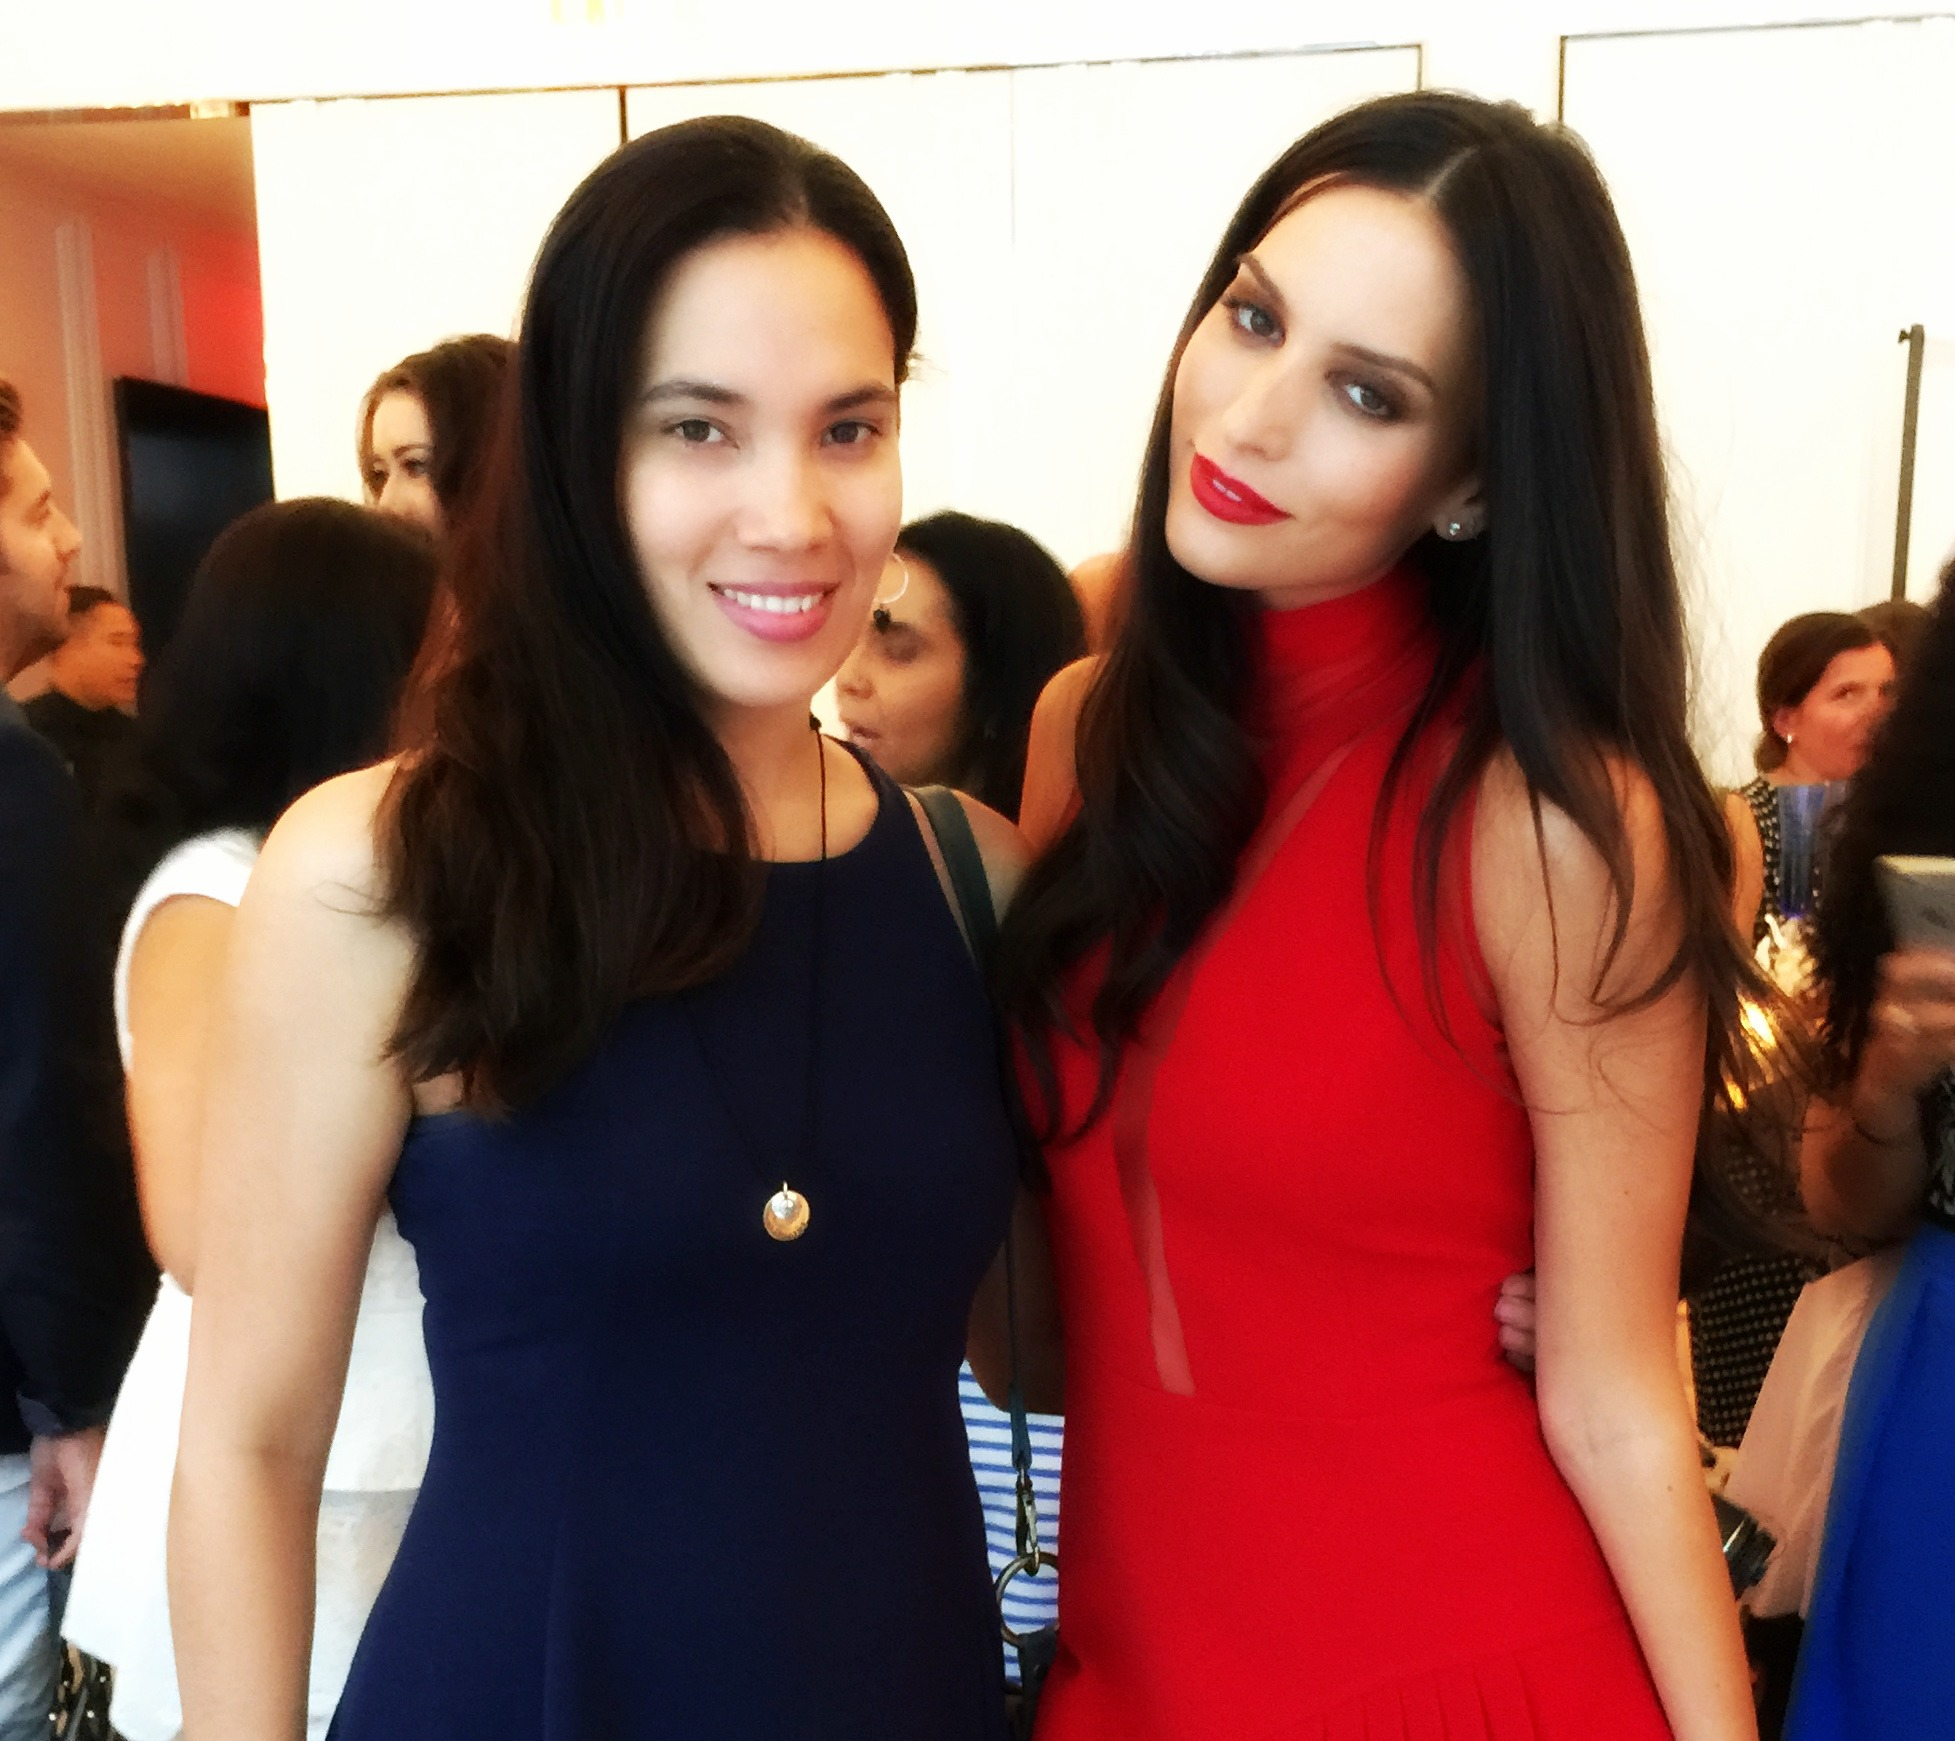 Genesis Rodriguez Nude with regard to génesis rodríguez shares her most valuable beauty secret – food vs